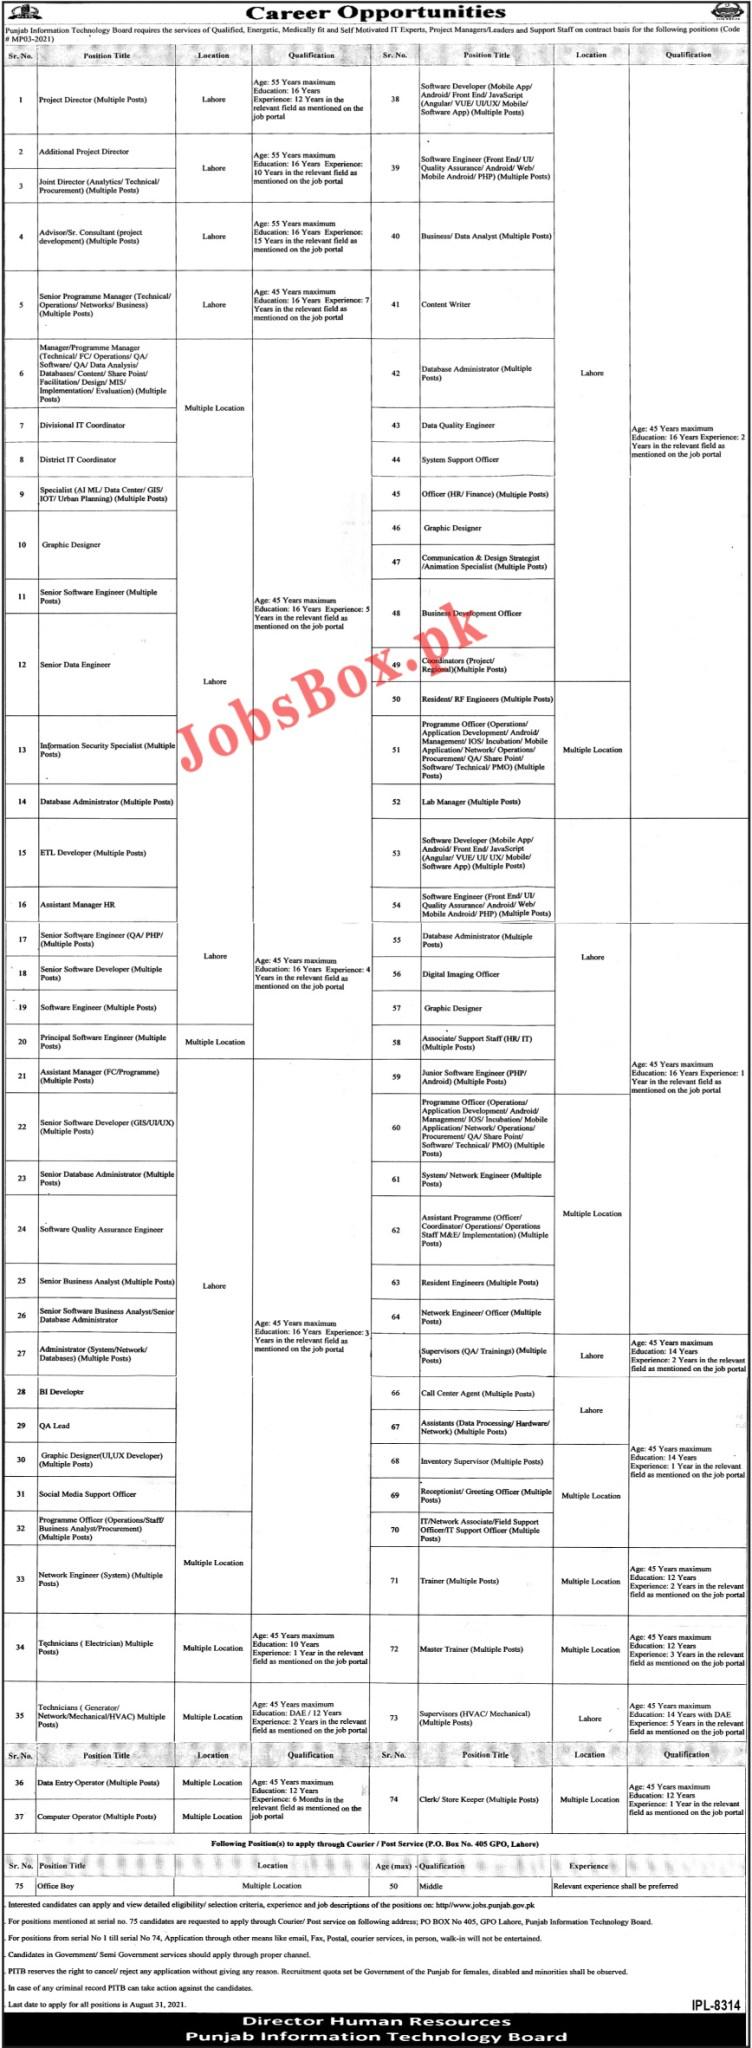 Punjab Information Technology Board PITB Jobs 2021 – Apply Online  www.jobs.punjab.gov.pk